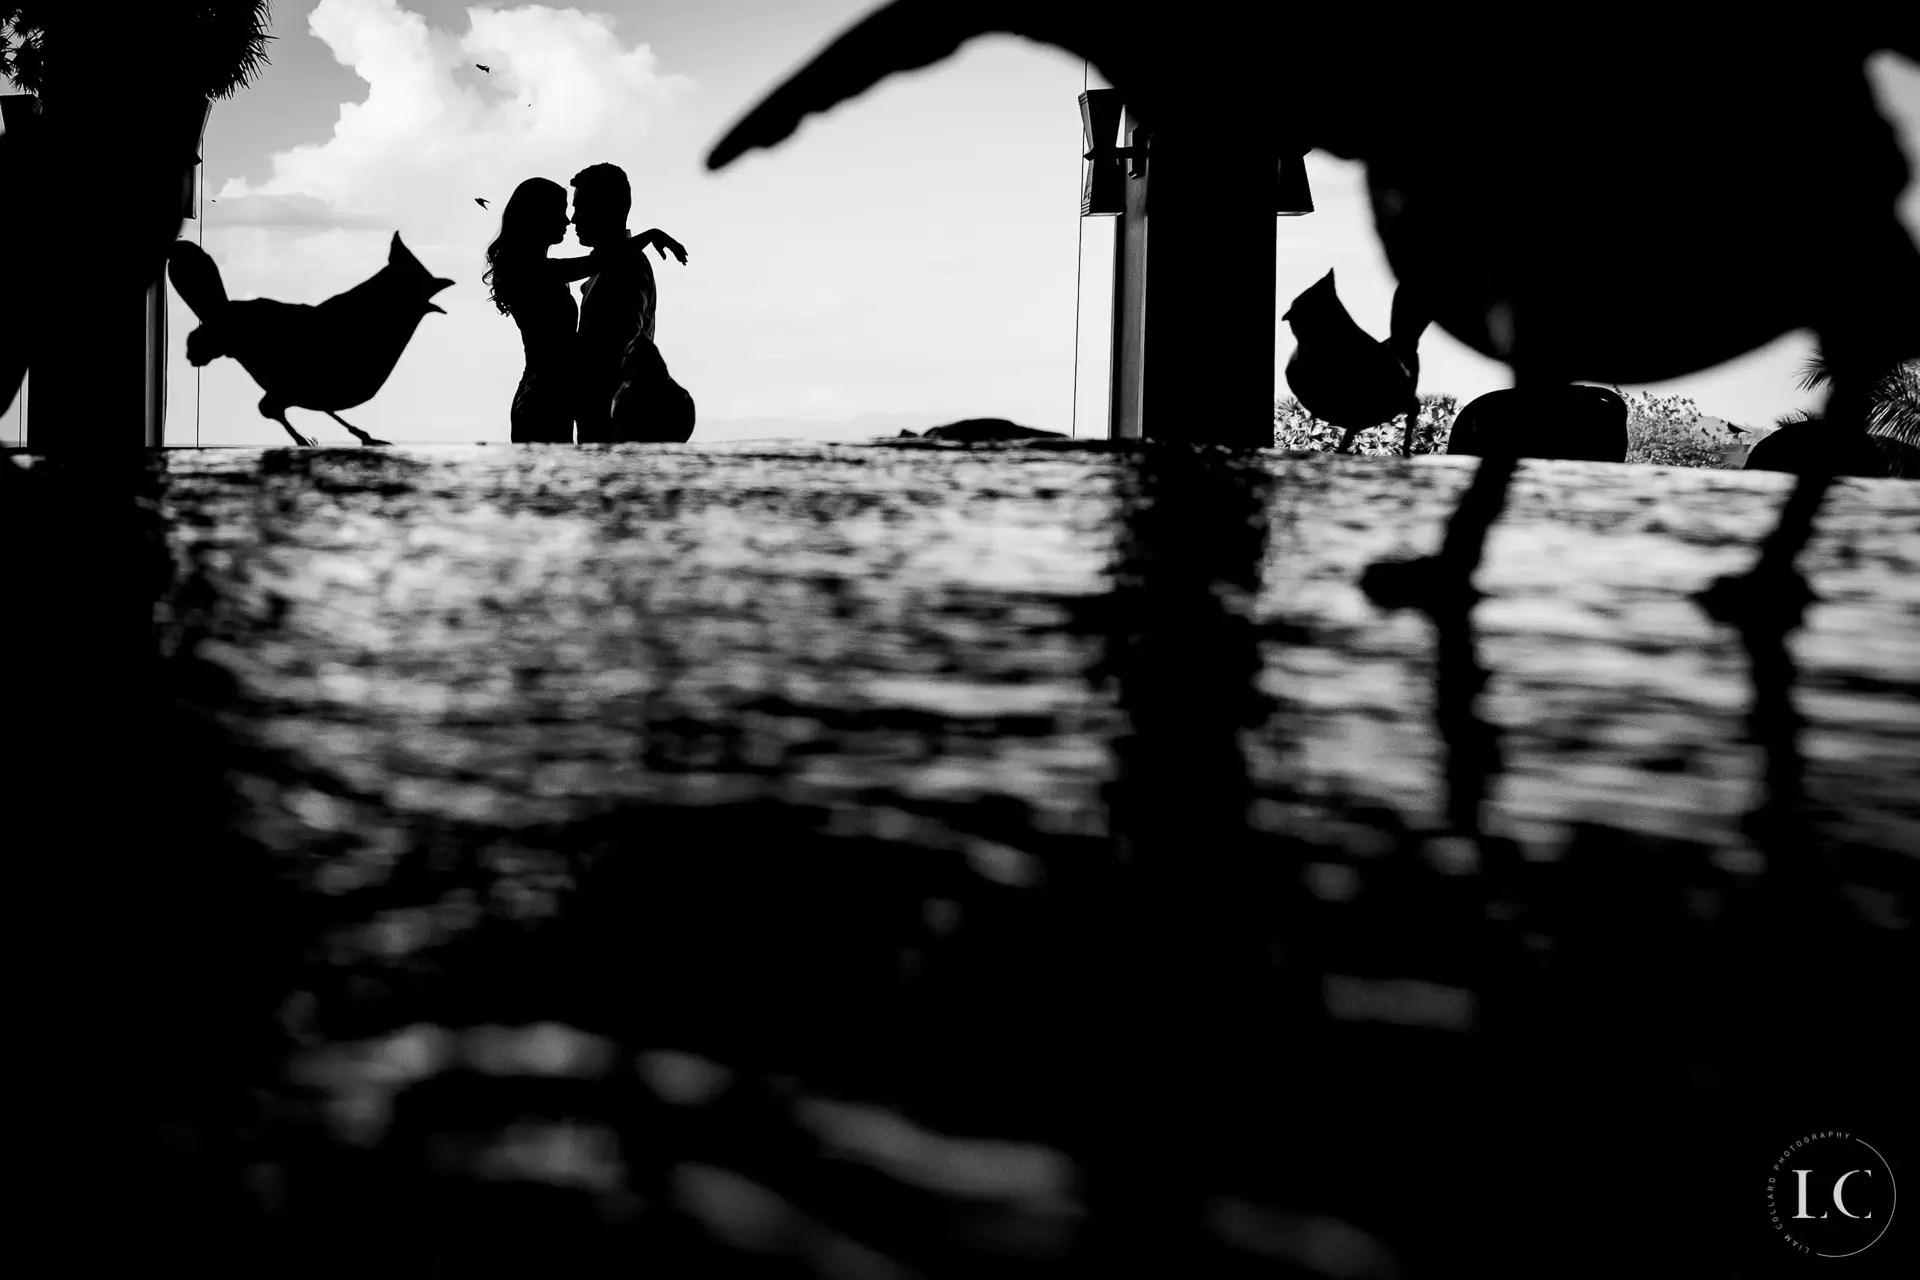 Bride and groom embracing shadows